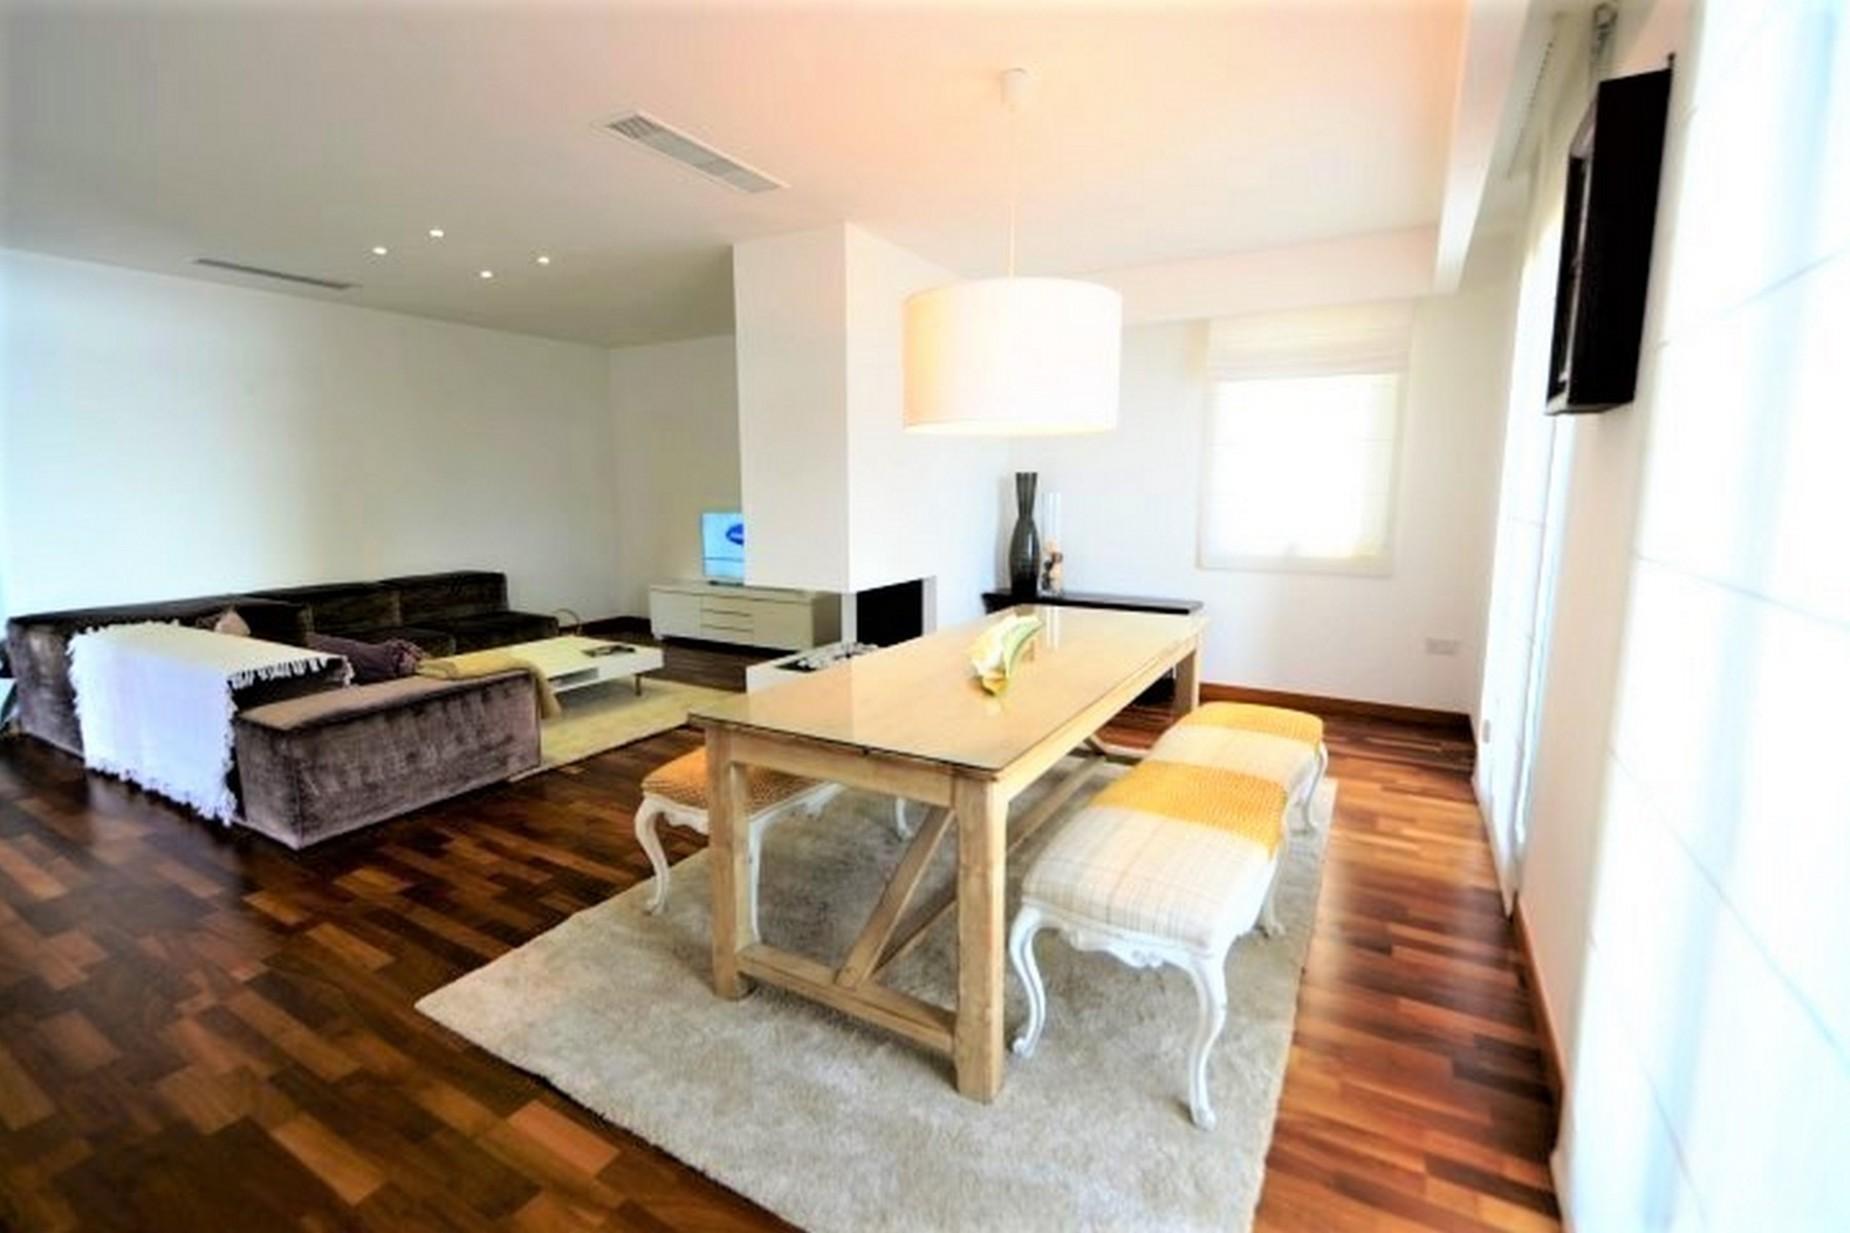 For Rent 3 bed Apartment in Sliema Sliema Malta, 3,800 EUR ...